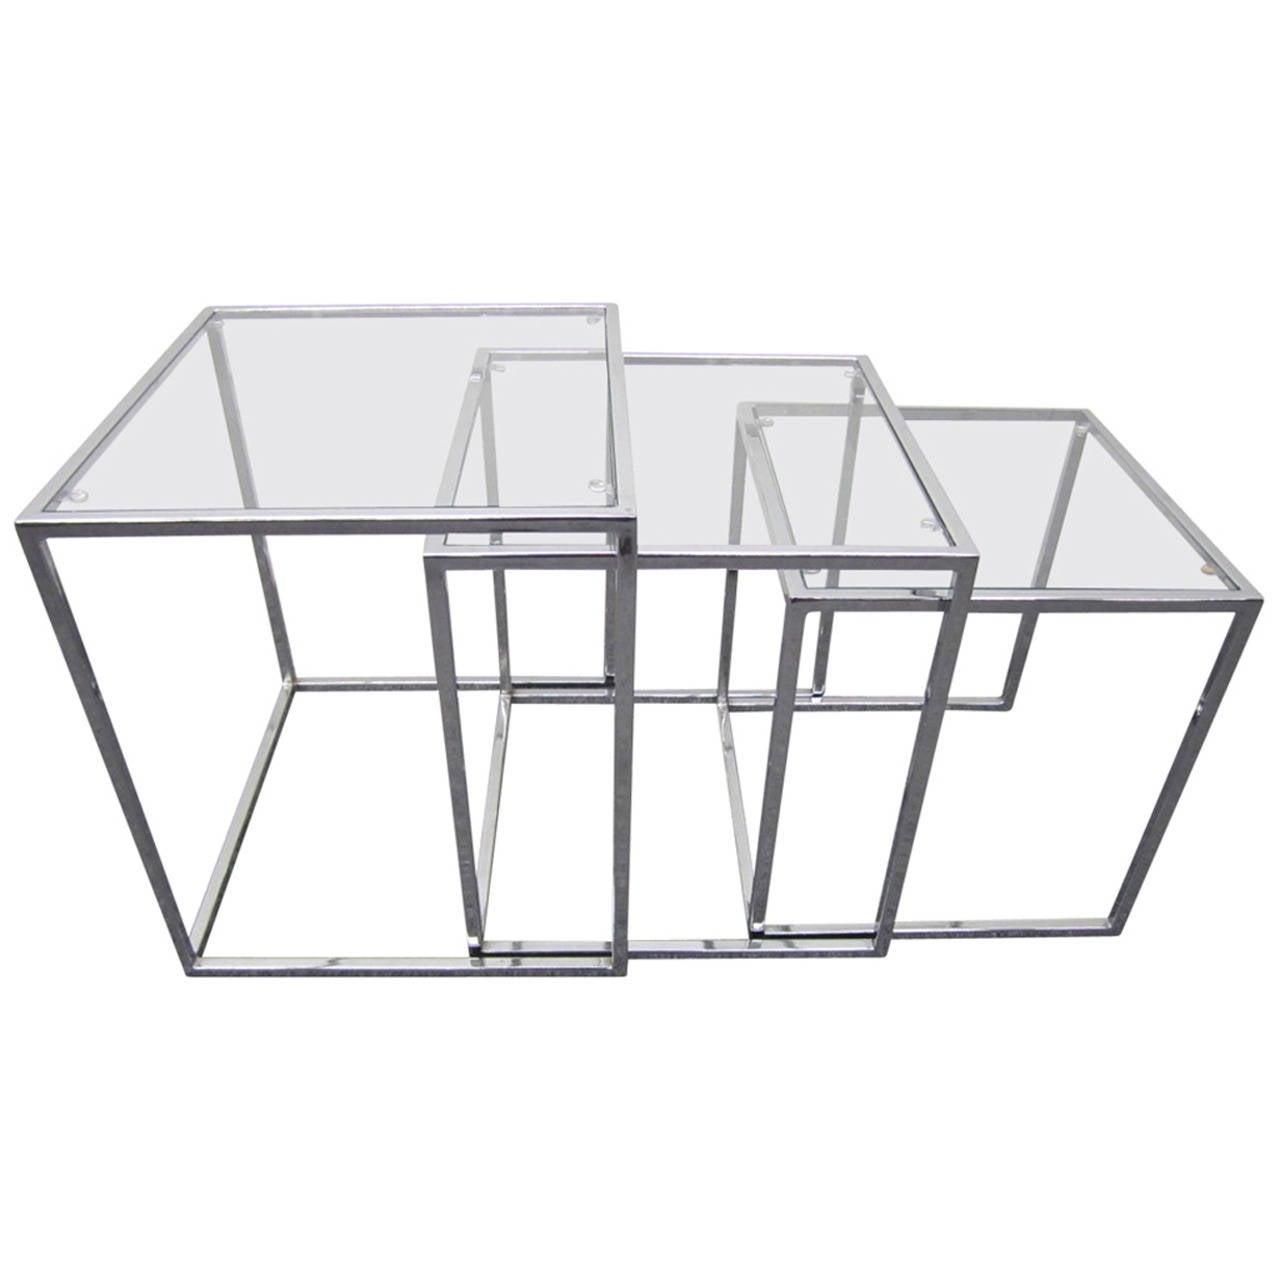 Fantastic Set of Milo Baughman Chrome Nesting Tables Mid-Century Modern